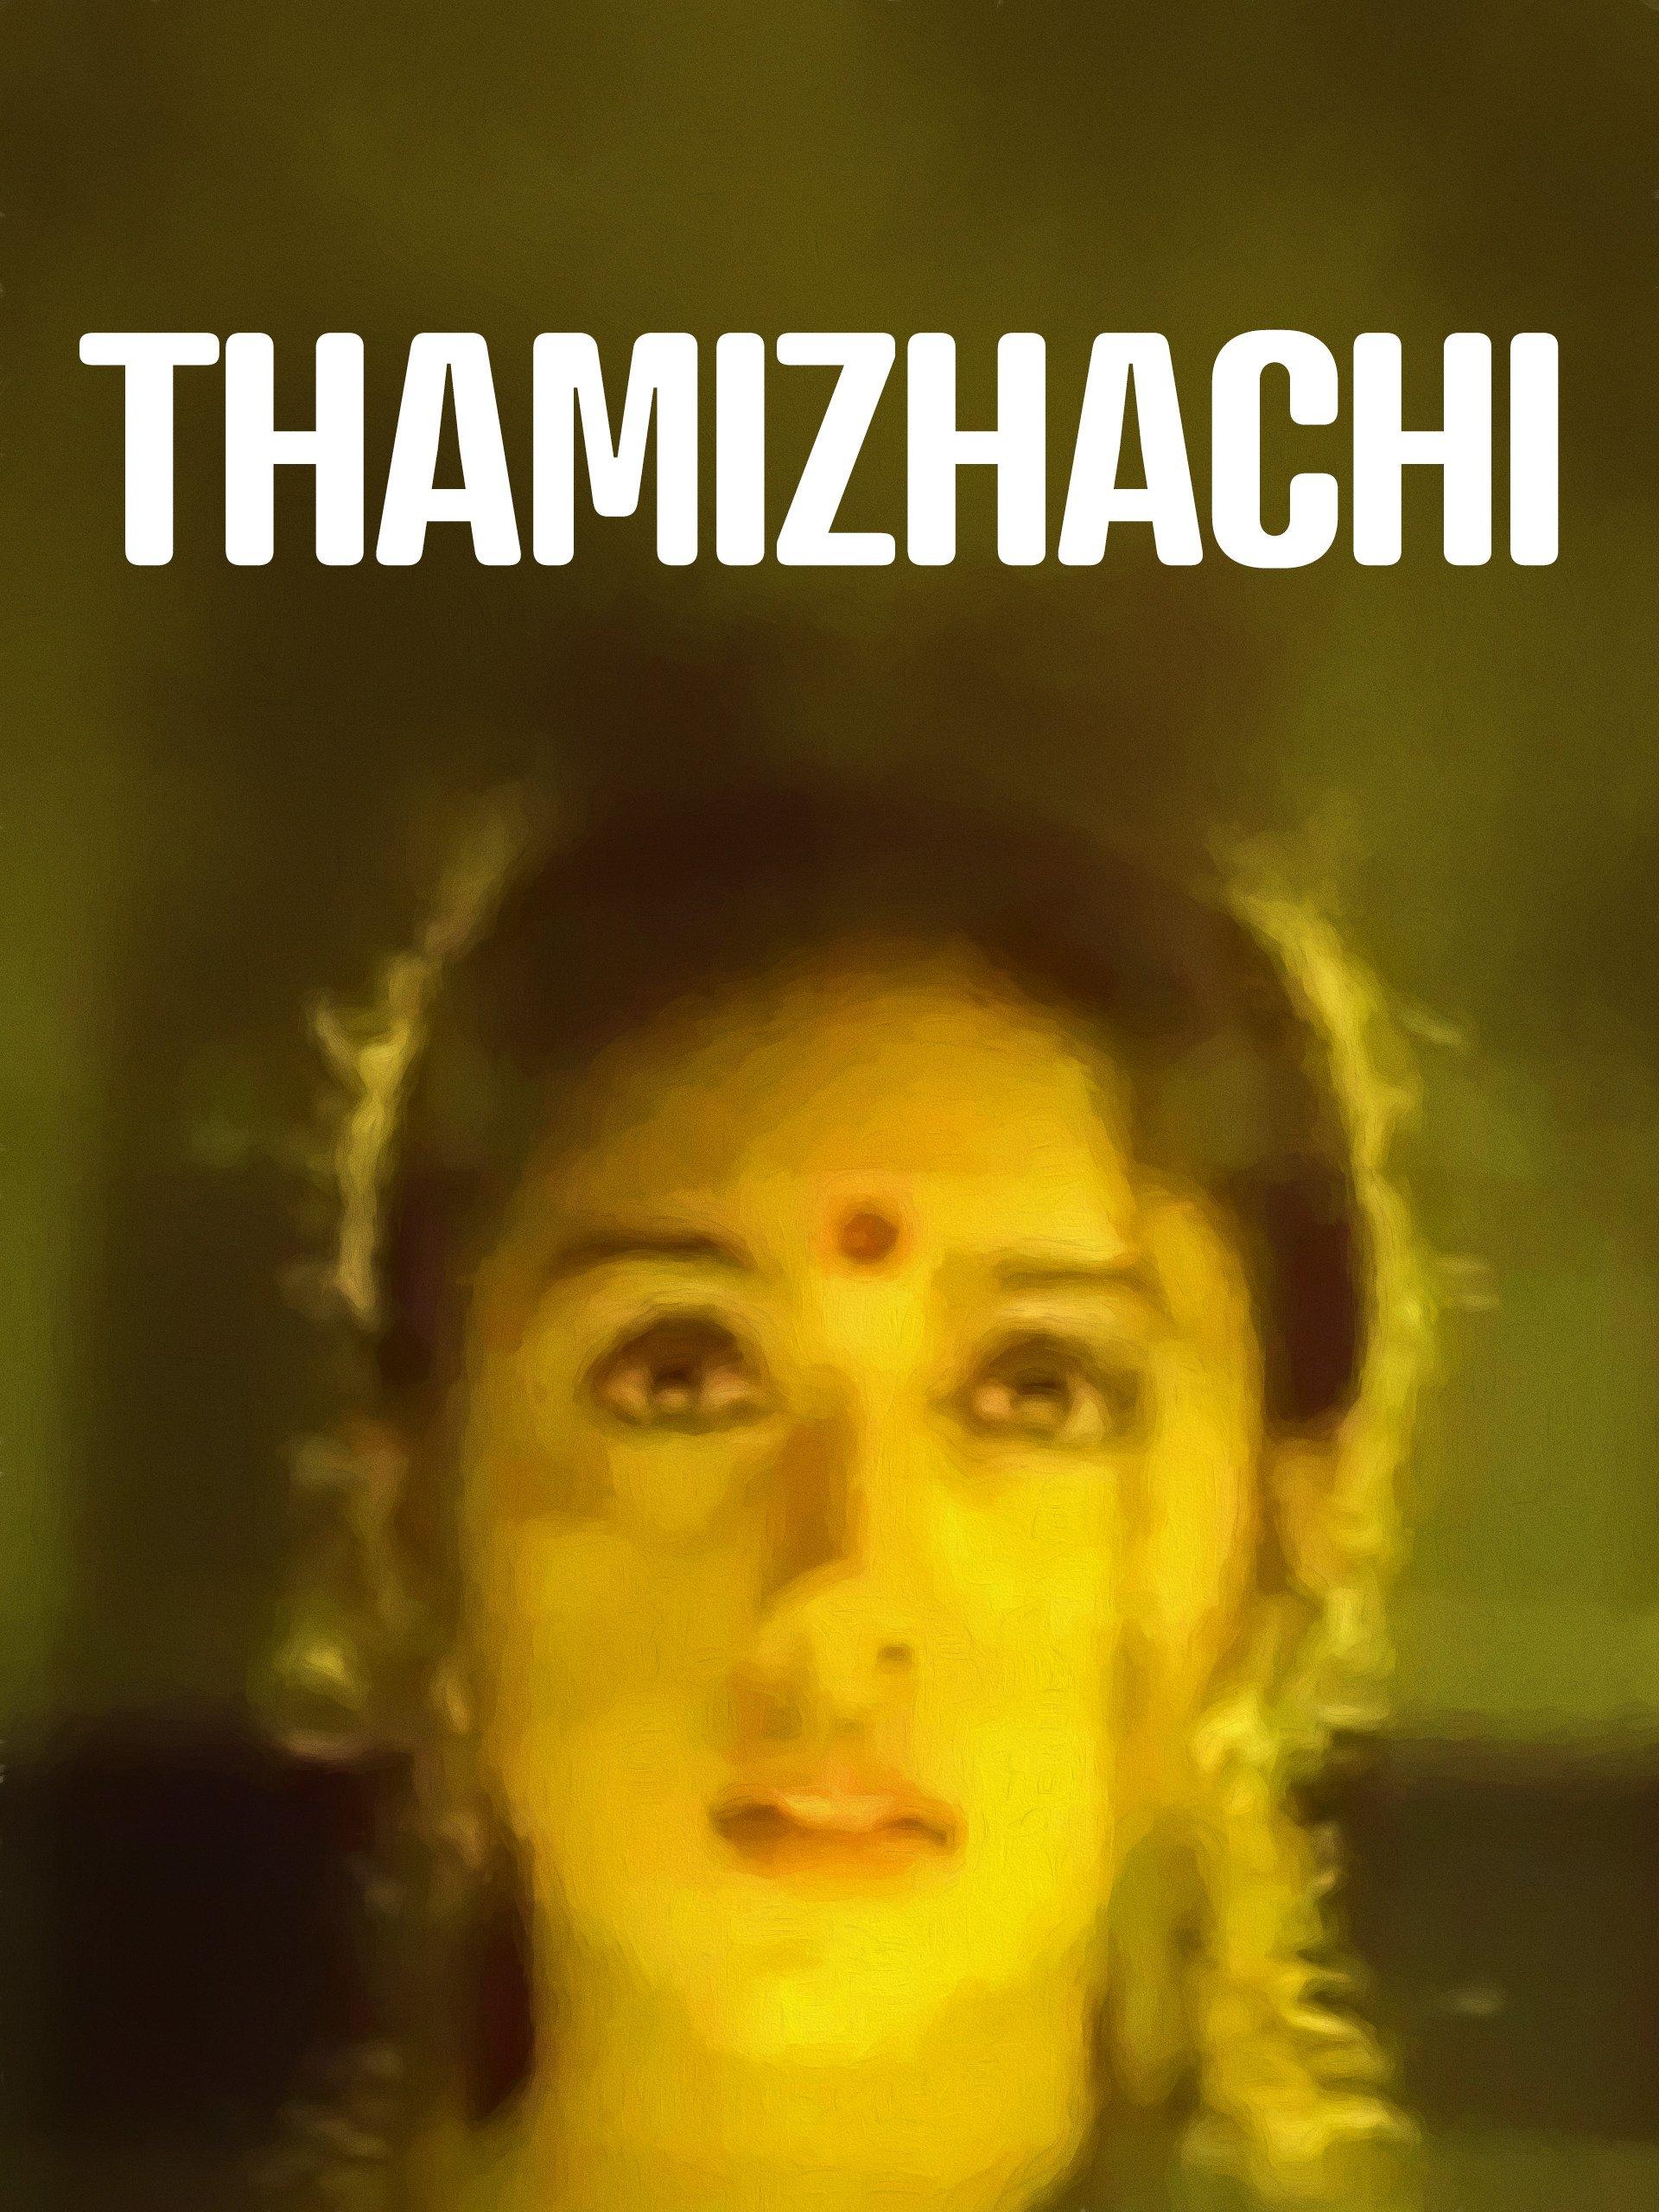 Fashion week Thamizhachi stylish mp3 free download for woman